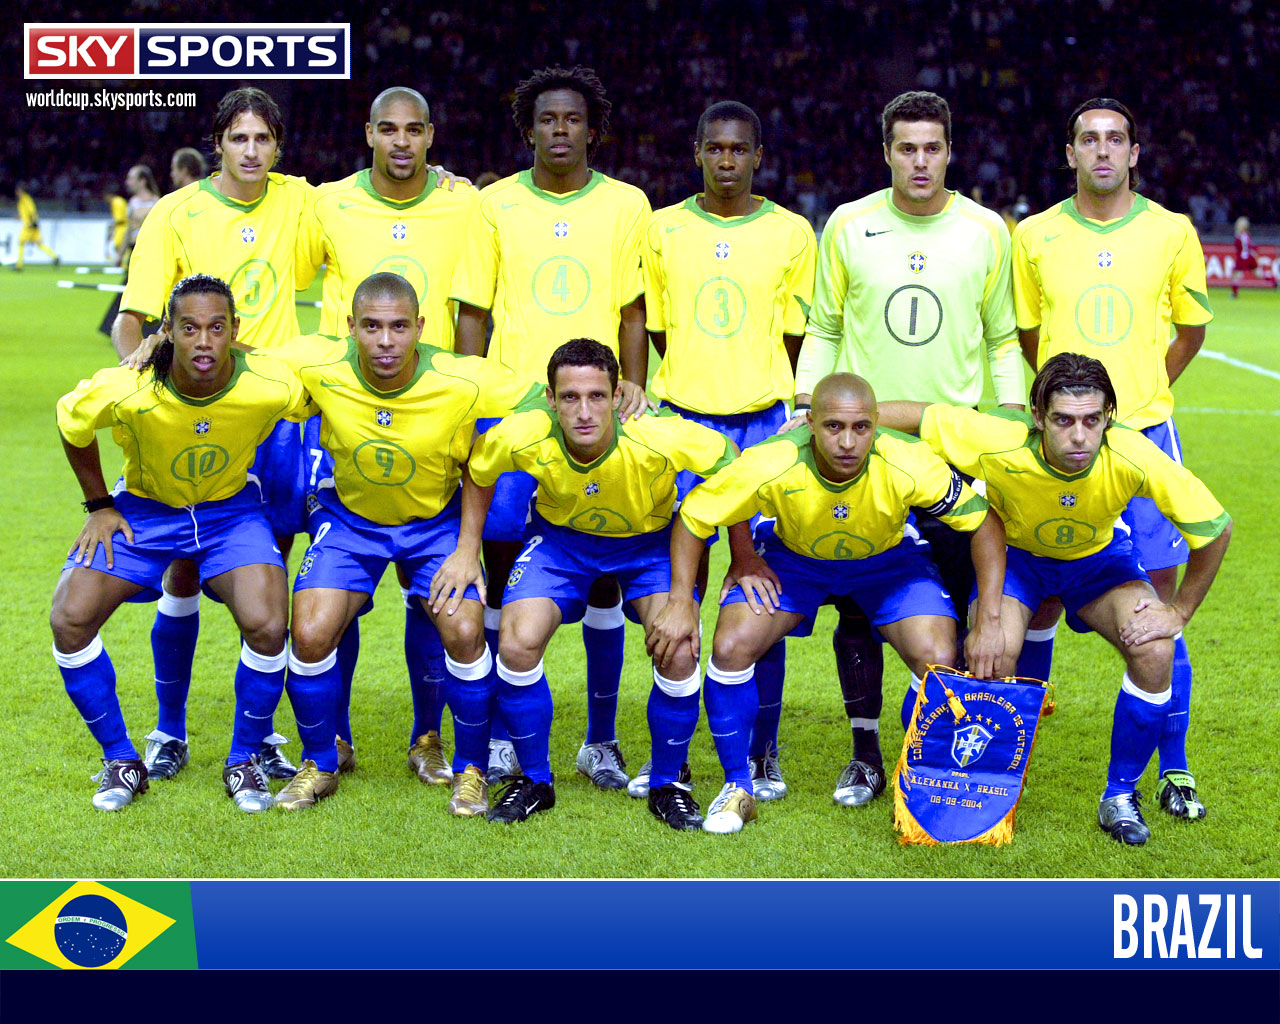 Brazil football team, brazil football team players, brazil football